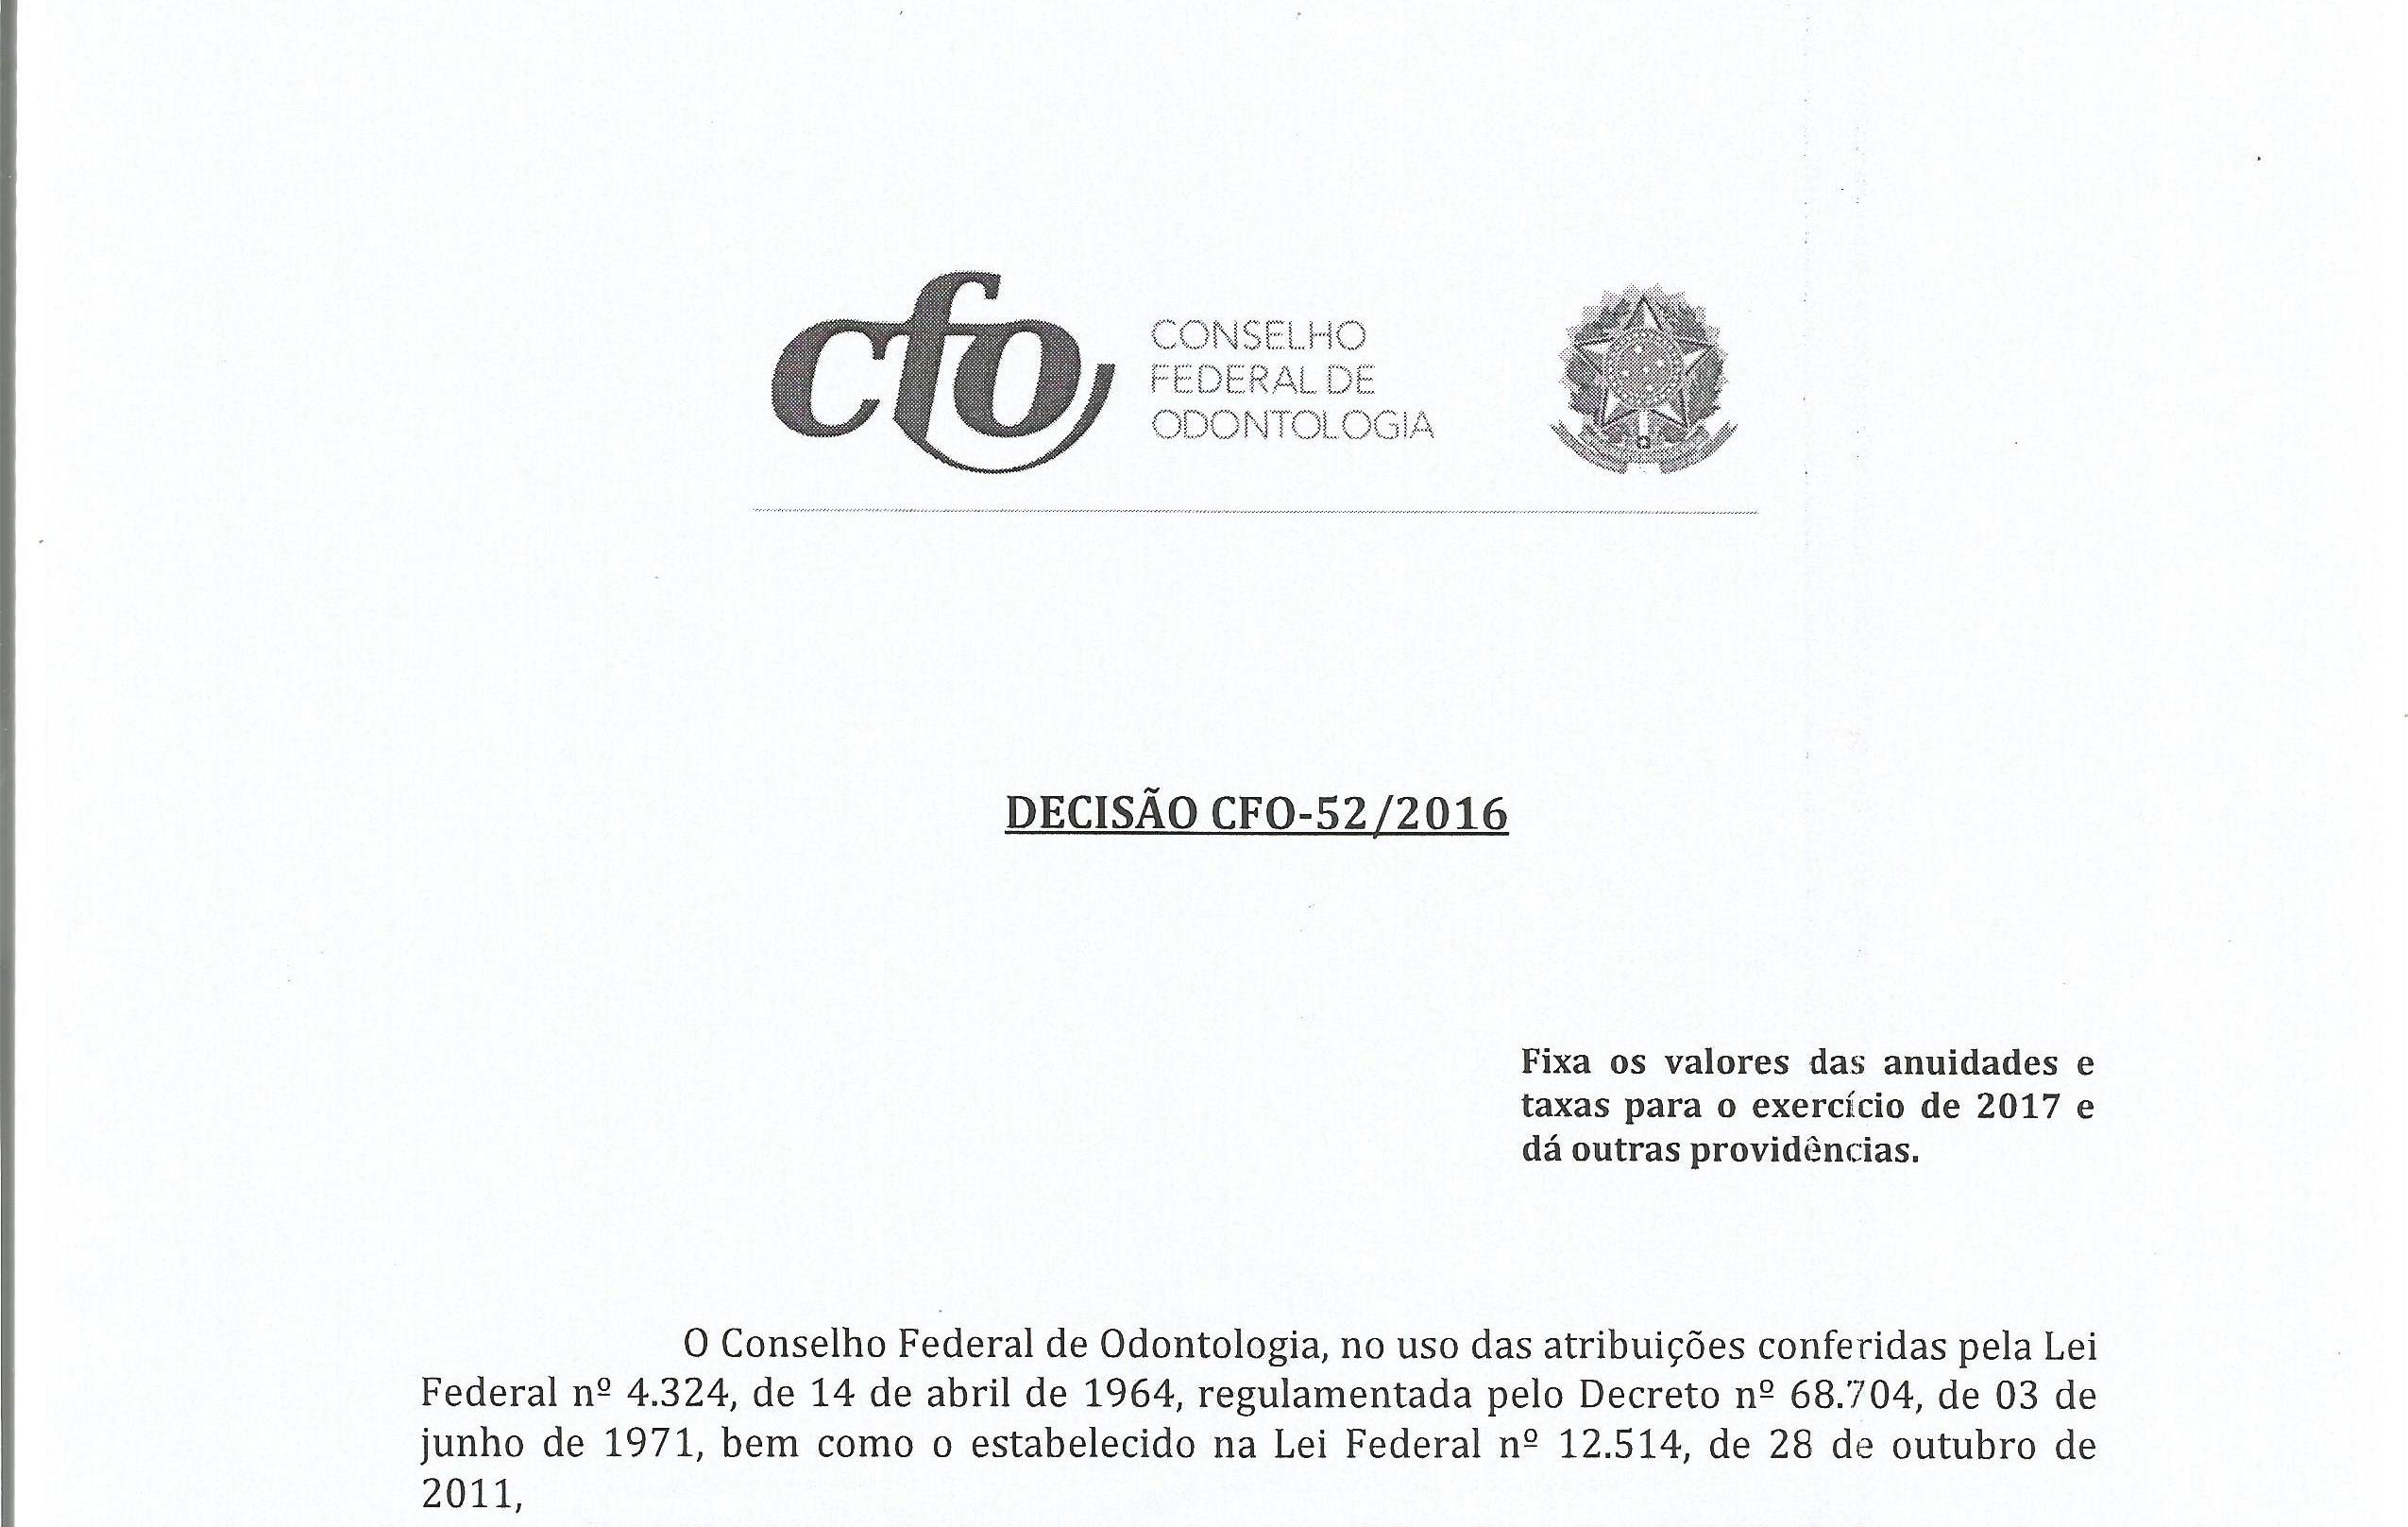 CFO FIXA OS VALORES DA ANUIDADES E TAXAS PARA O EXERCÍCIO DE 2017